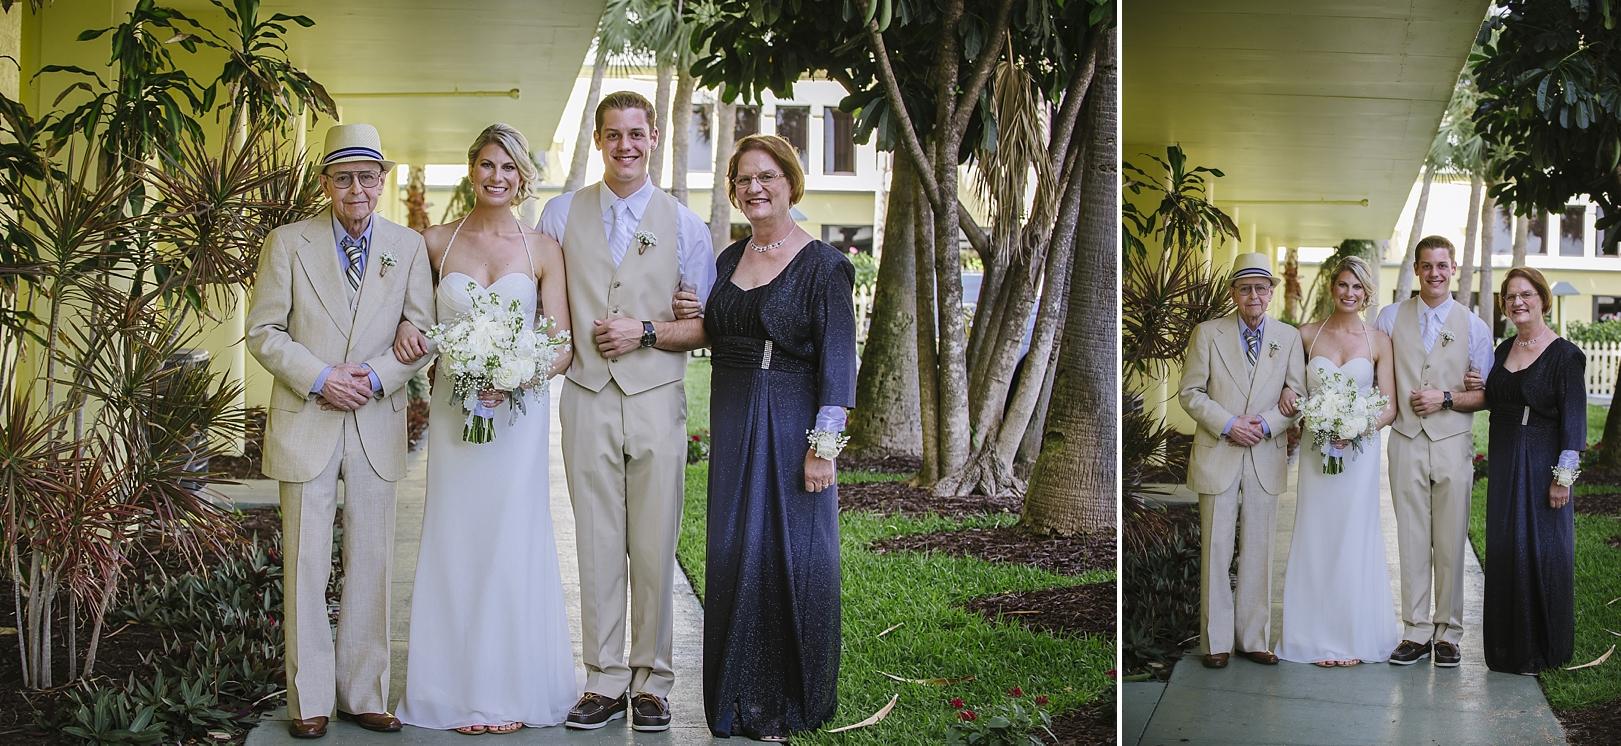 family formals sirata beach wedding photos